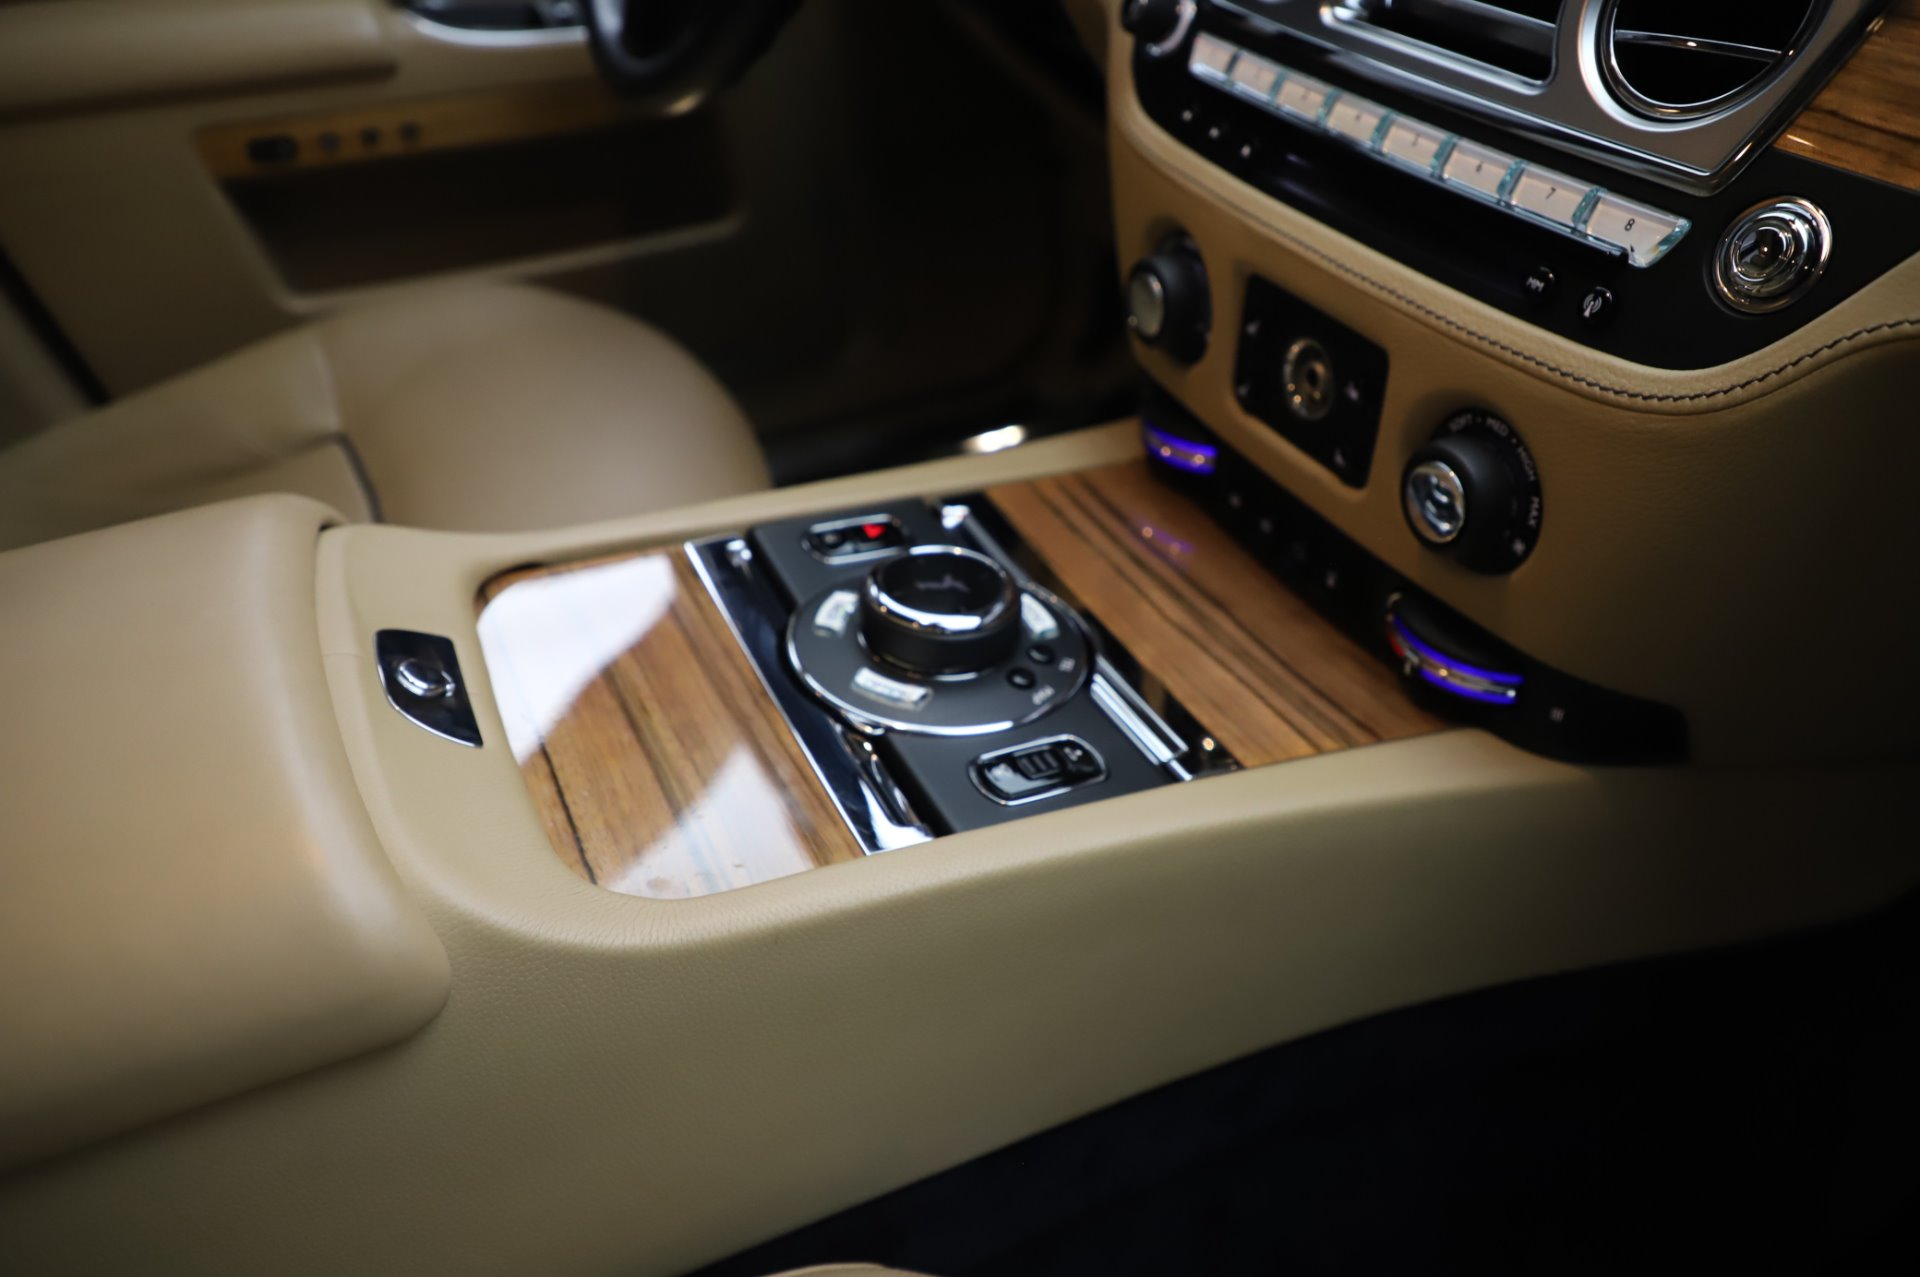 Used 2014 Rolls-Royce Ghost V-Spec For Sale In Westport, CT 858_p18